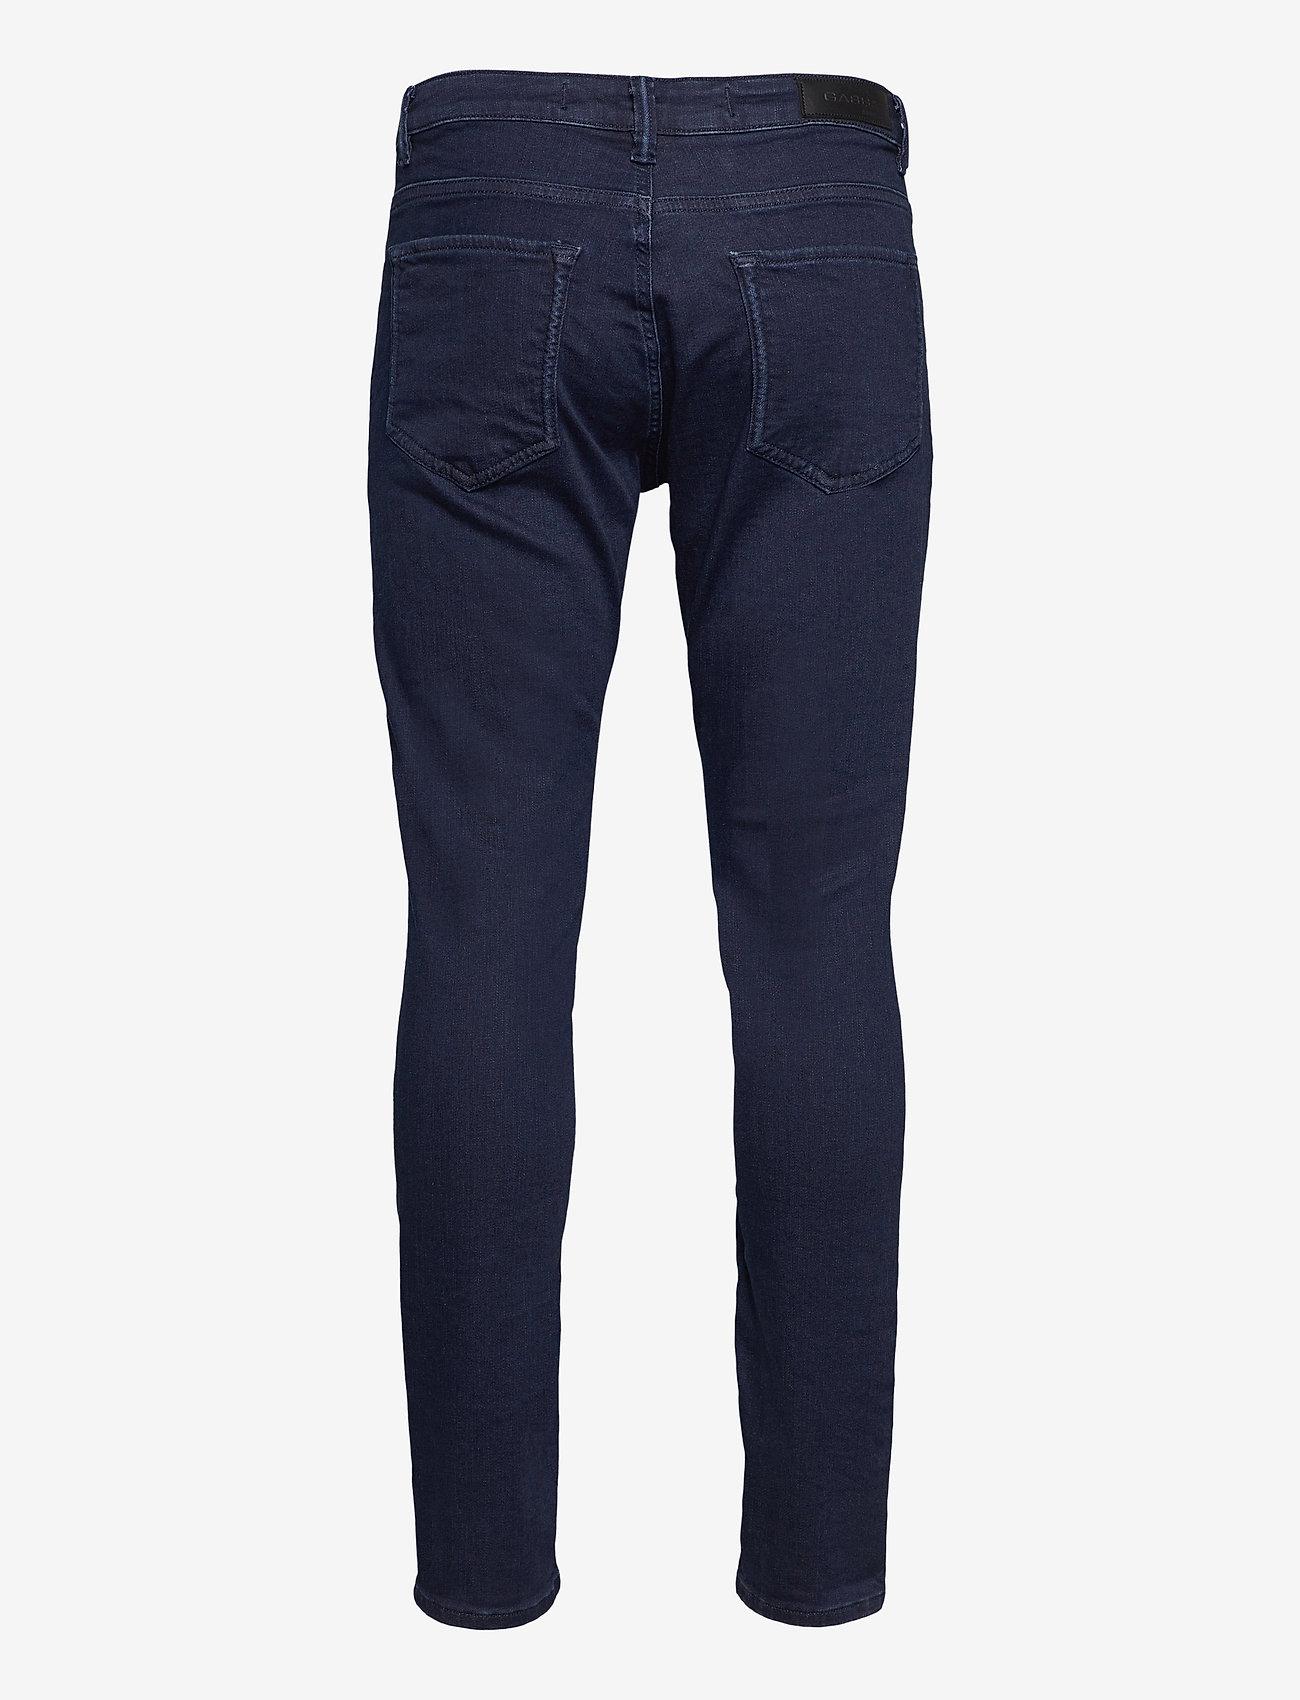 Gabba - Jones K3869 Jeans - slim jeans - rs1344 - 1